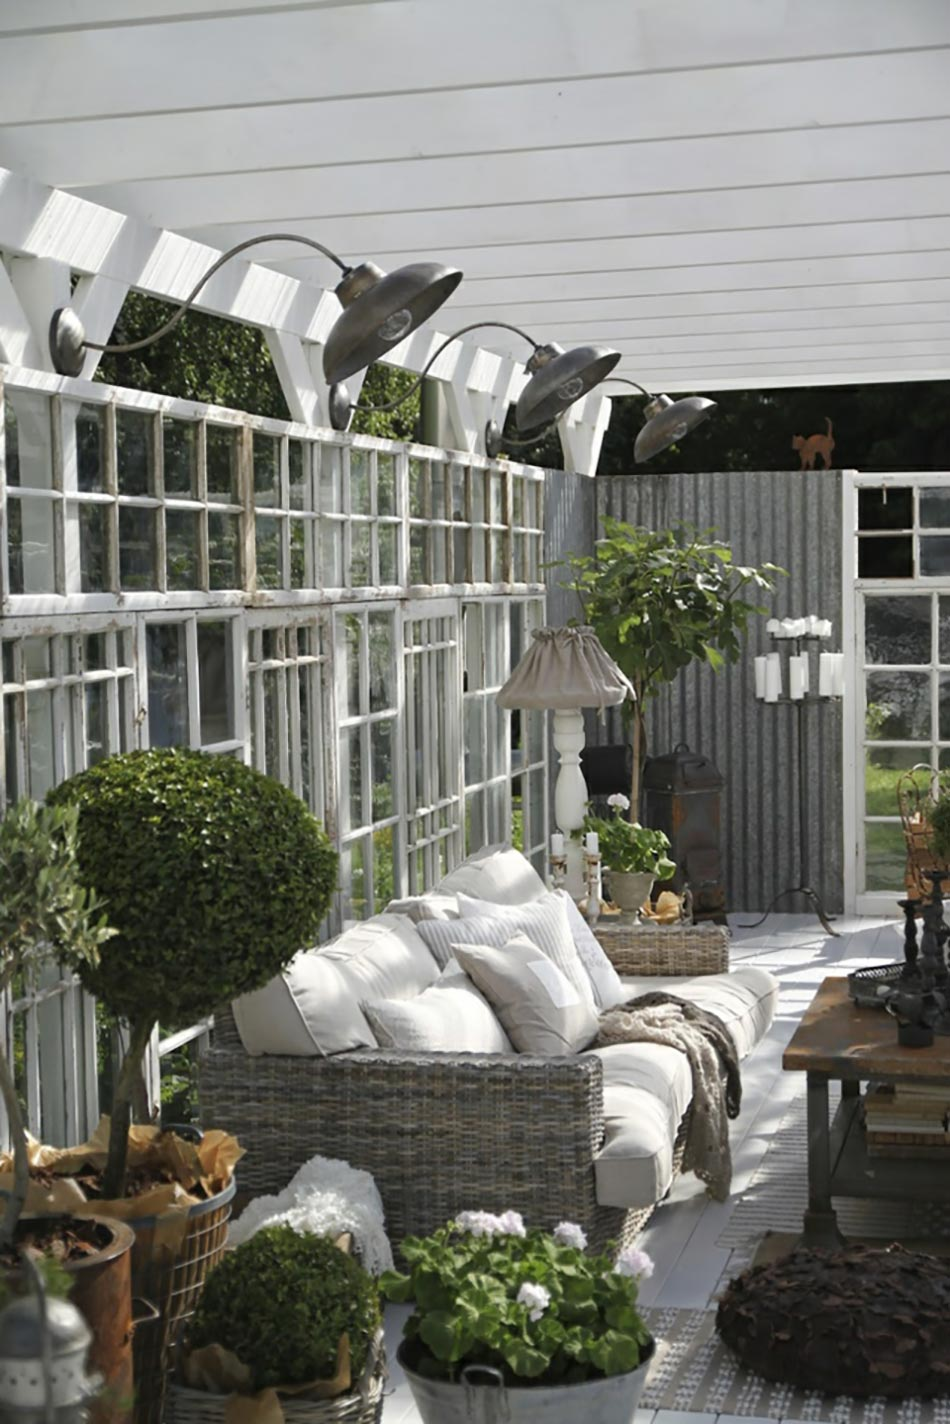 salon de jardin pour embellir une